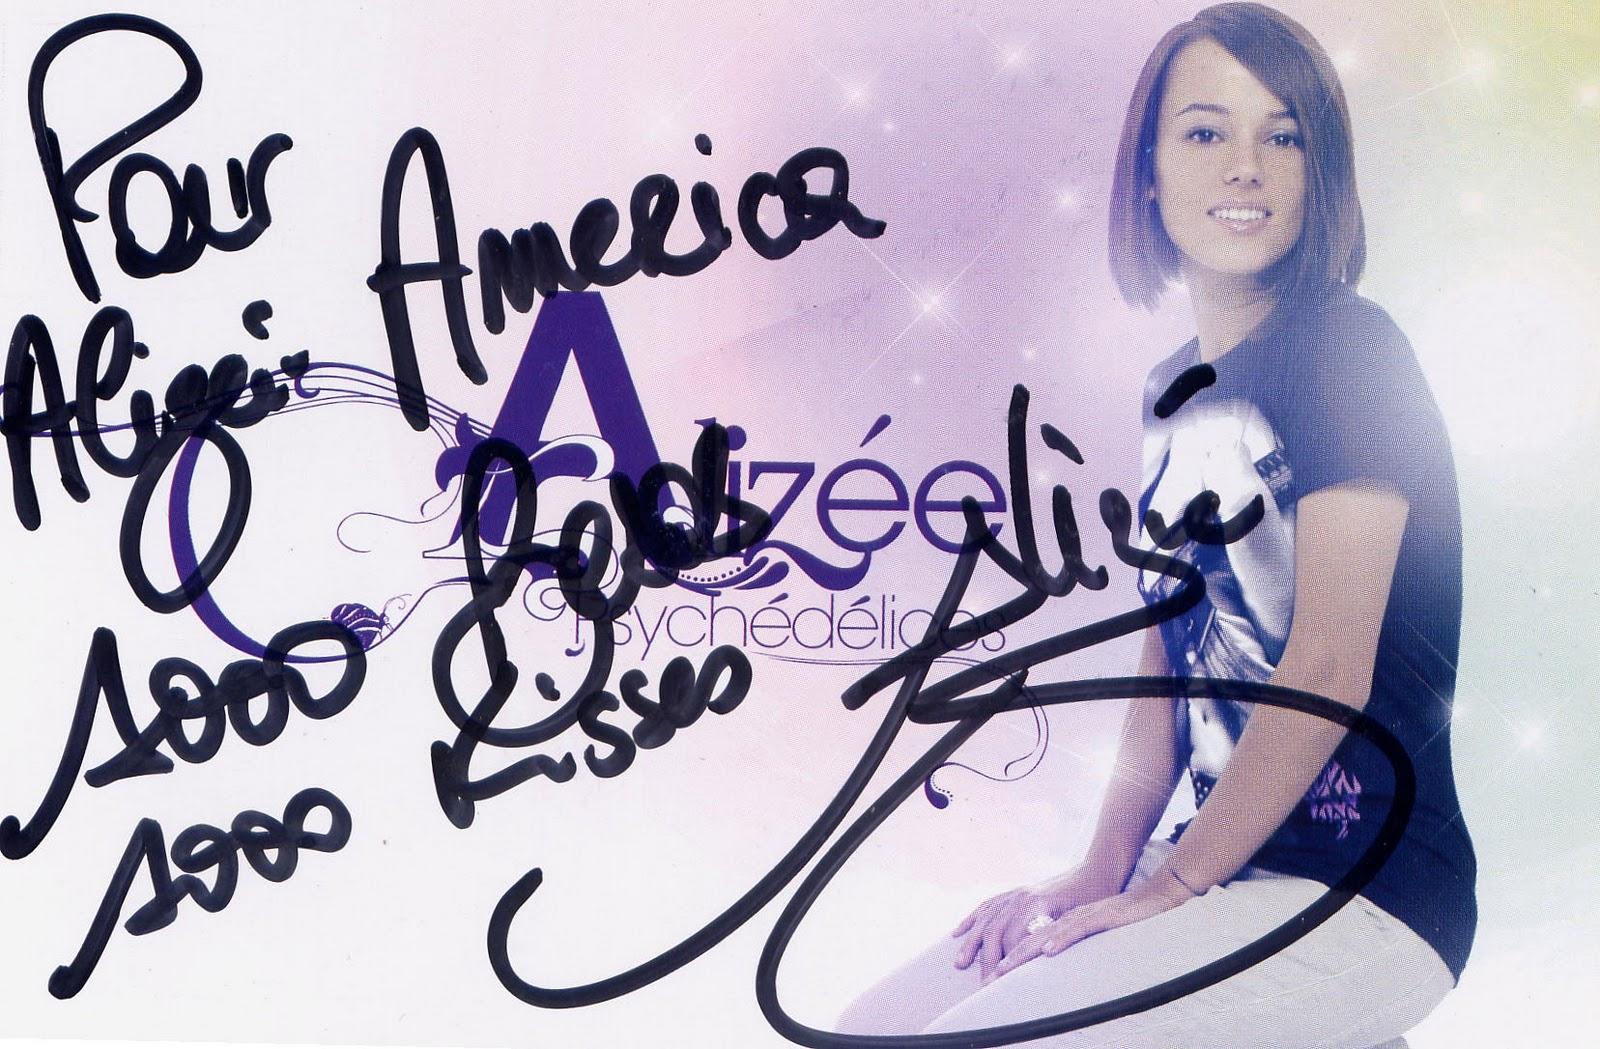 http://2.bp.blogspot.com/-5Msc_xIkncw/TZZdVrCALiI/AAAAAAAABqs/PCfMJmJWGkE/s1600/autograph.jpg